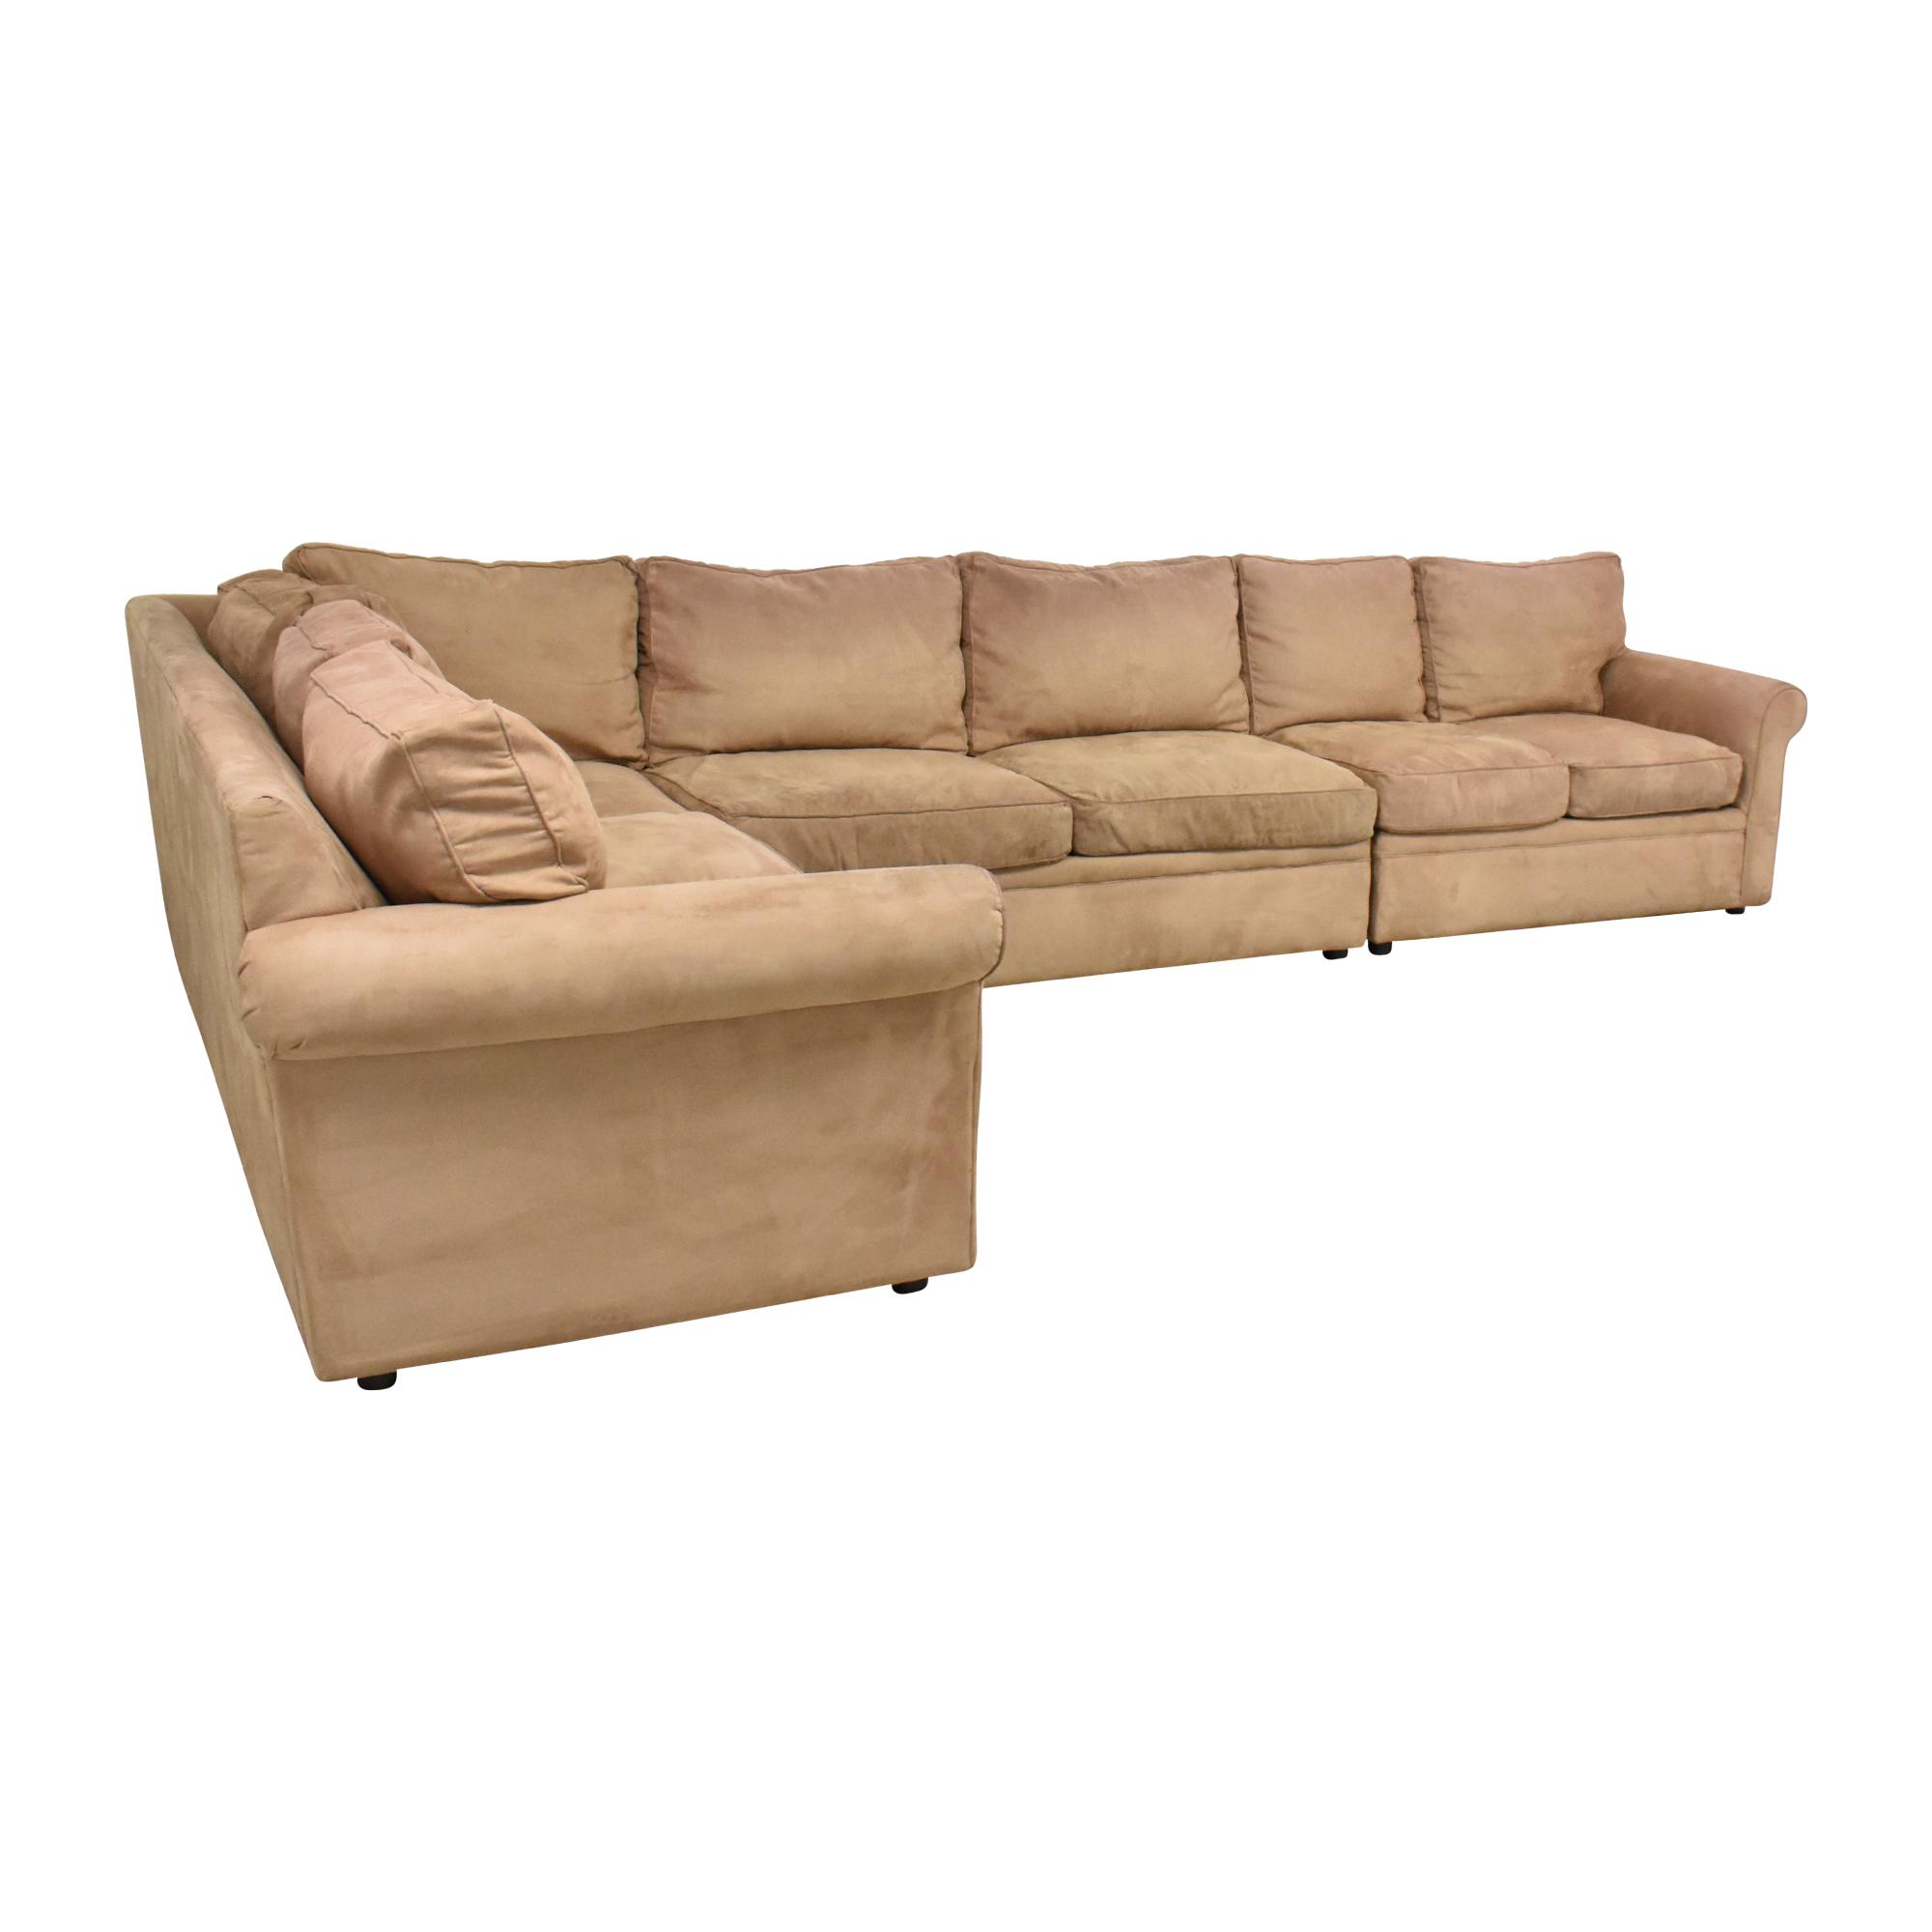 buy Rowe Furniture Corner Sectional Sofa Rowe Furniture